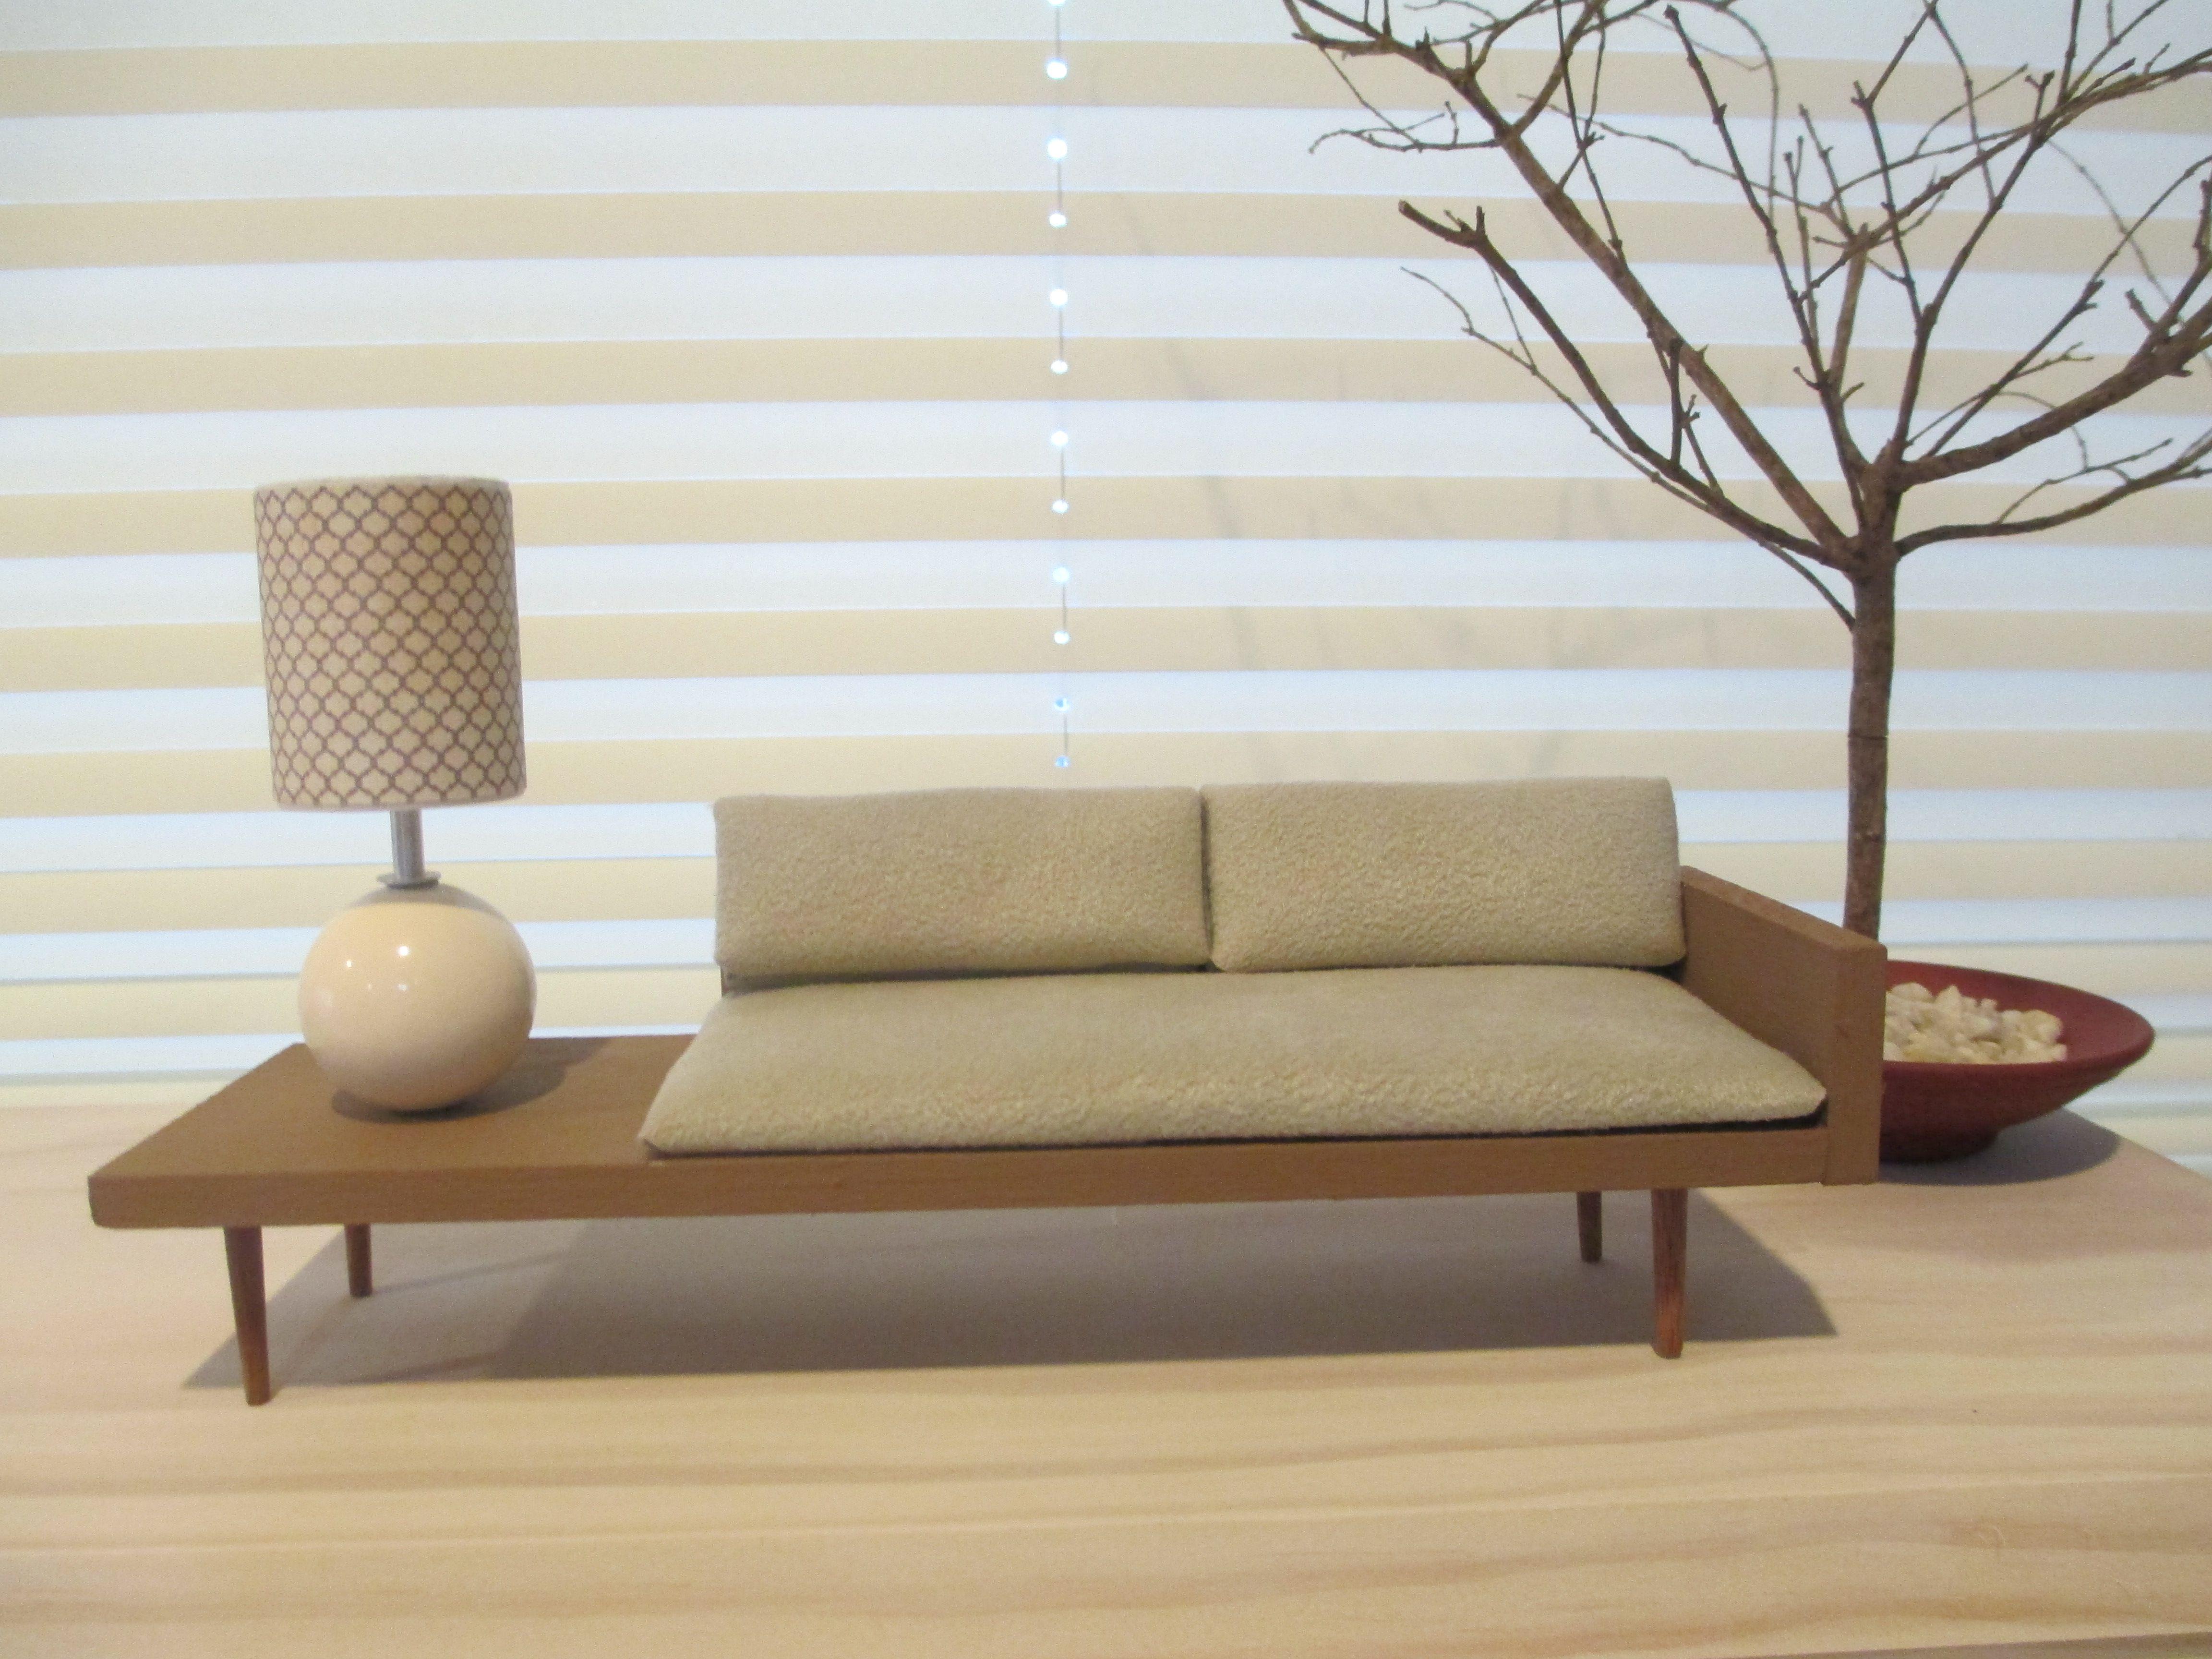 Miniature Mid Century Modern Sofa Made By Me Modern Dollhouse